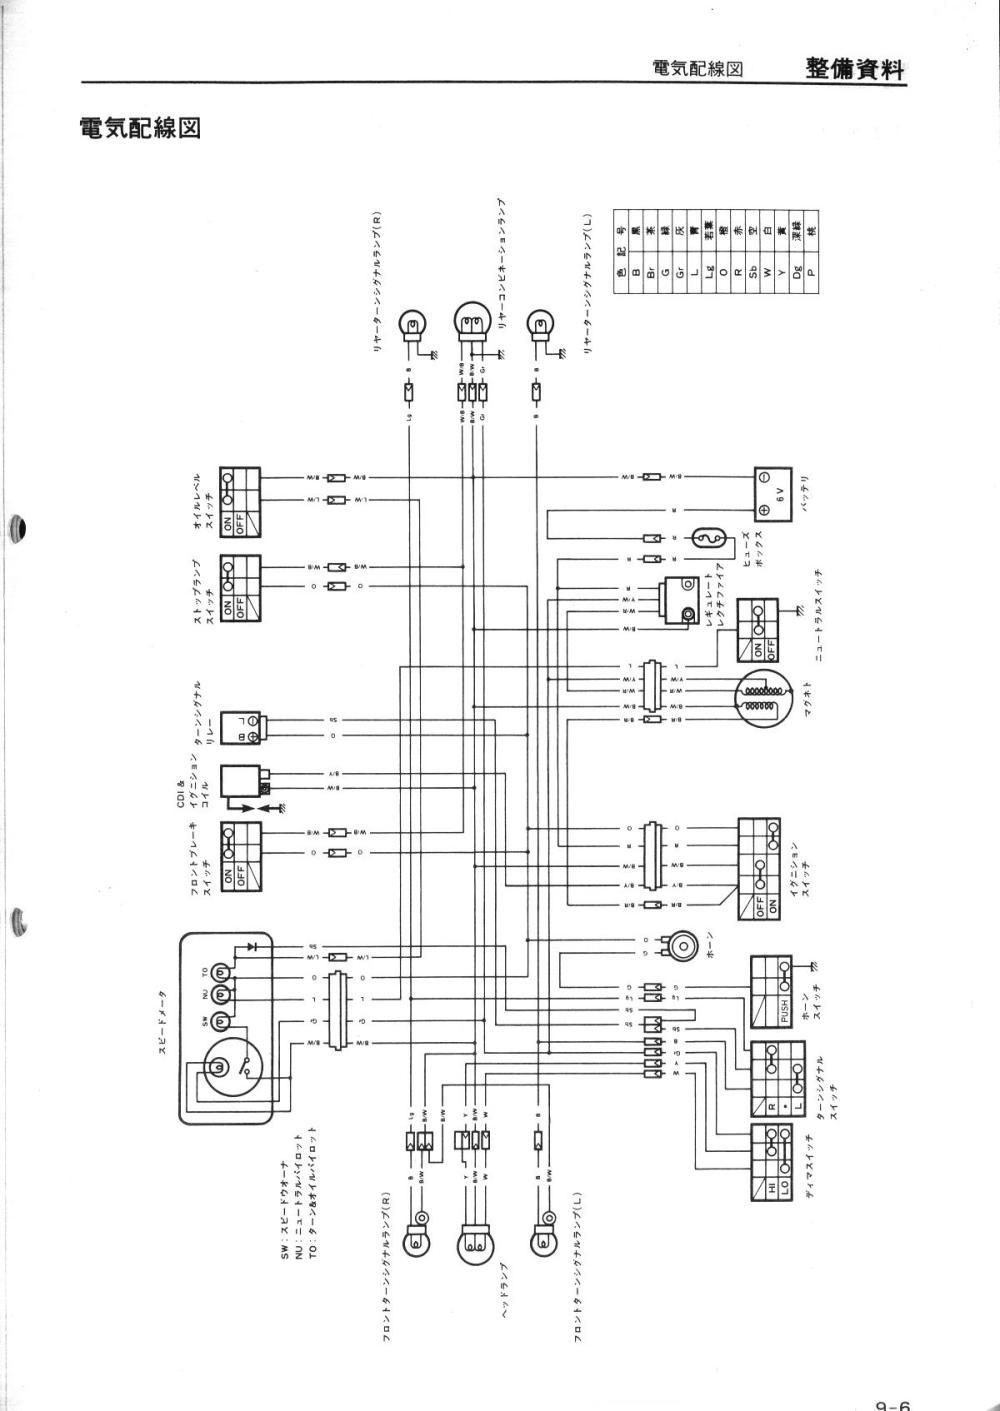 medium resolution of epo wiring diagram 18 wiring diagram images wiring dpdt relay wiring diagram epo shunt trip breaker